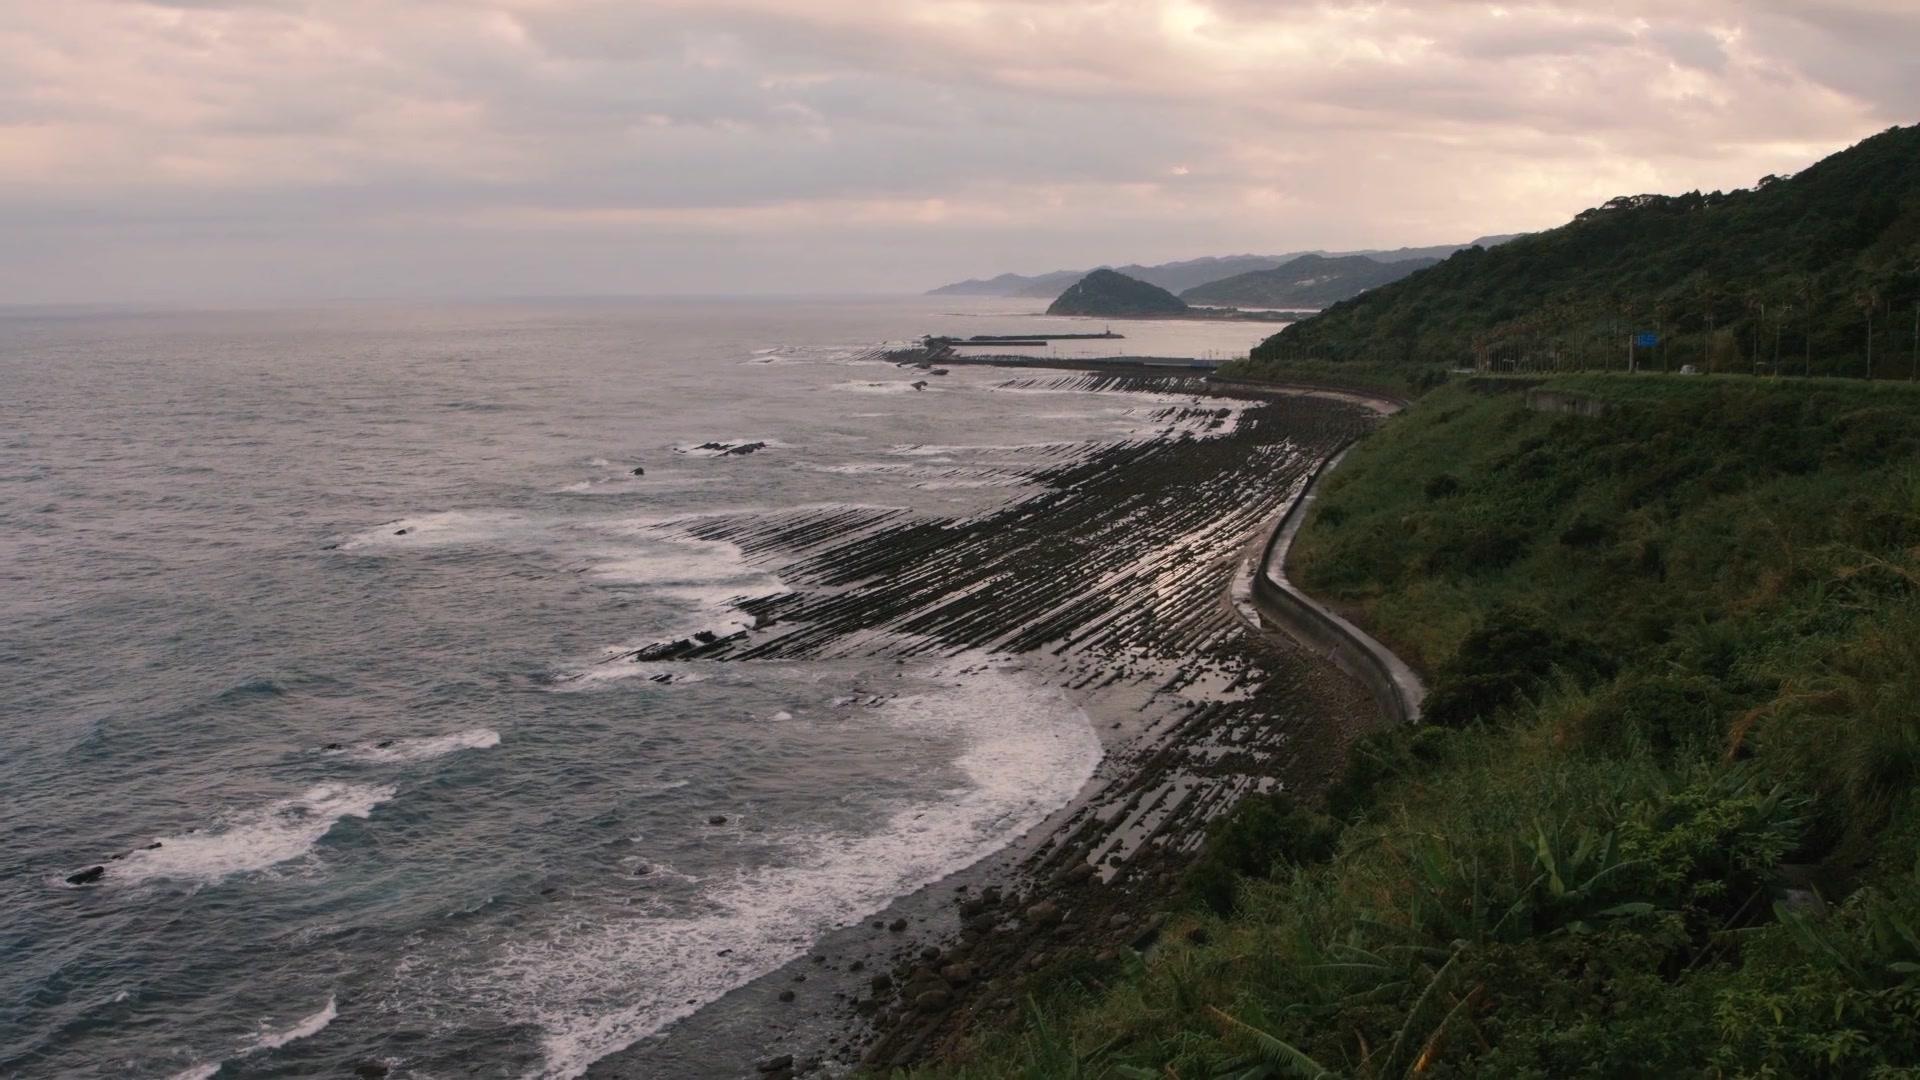 Fukuoka Tourism 2018: Best of Fukuoka, Japan - TripAdvisor